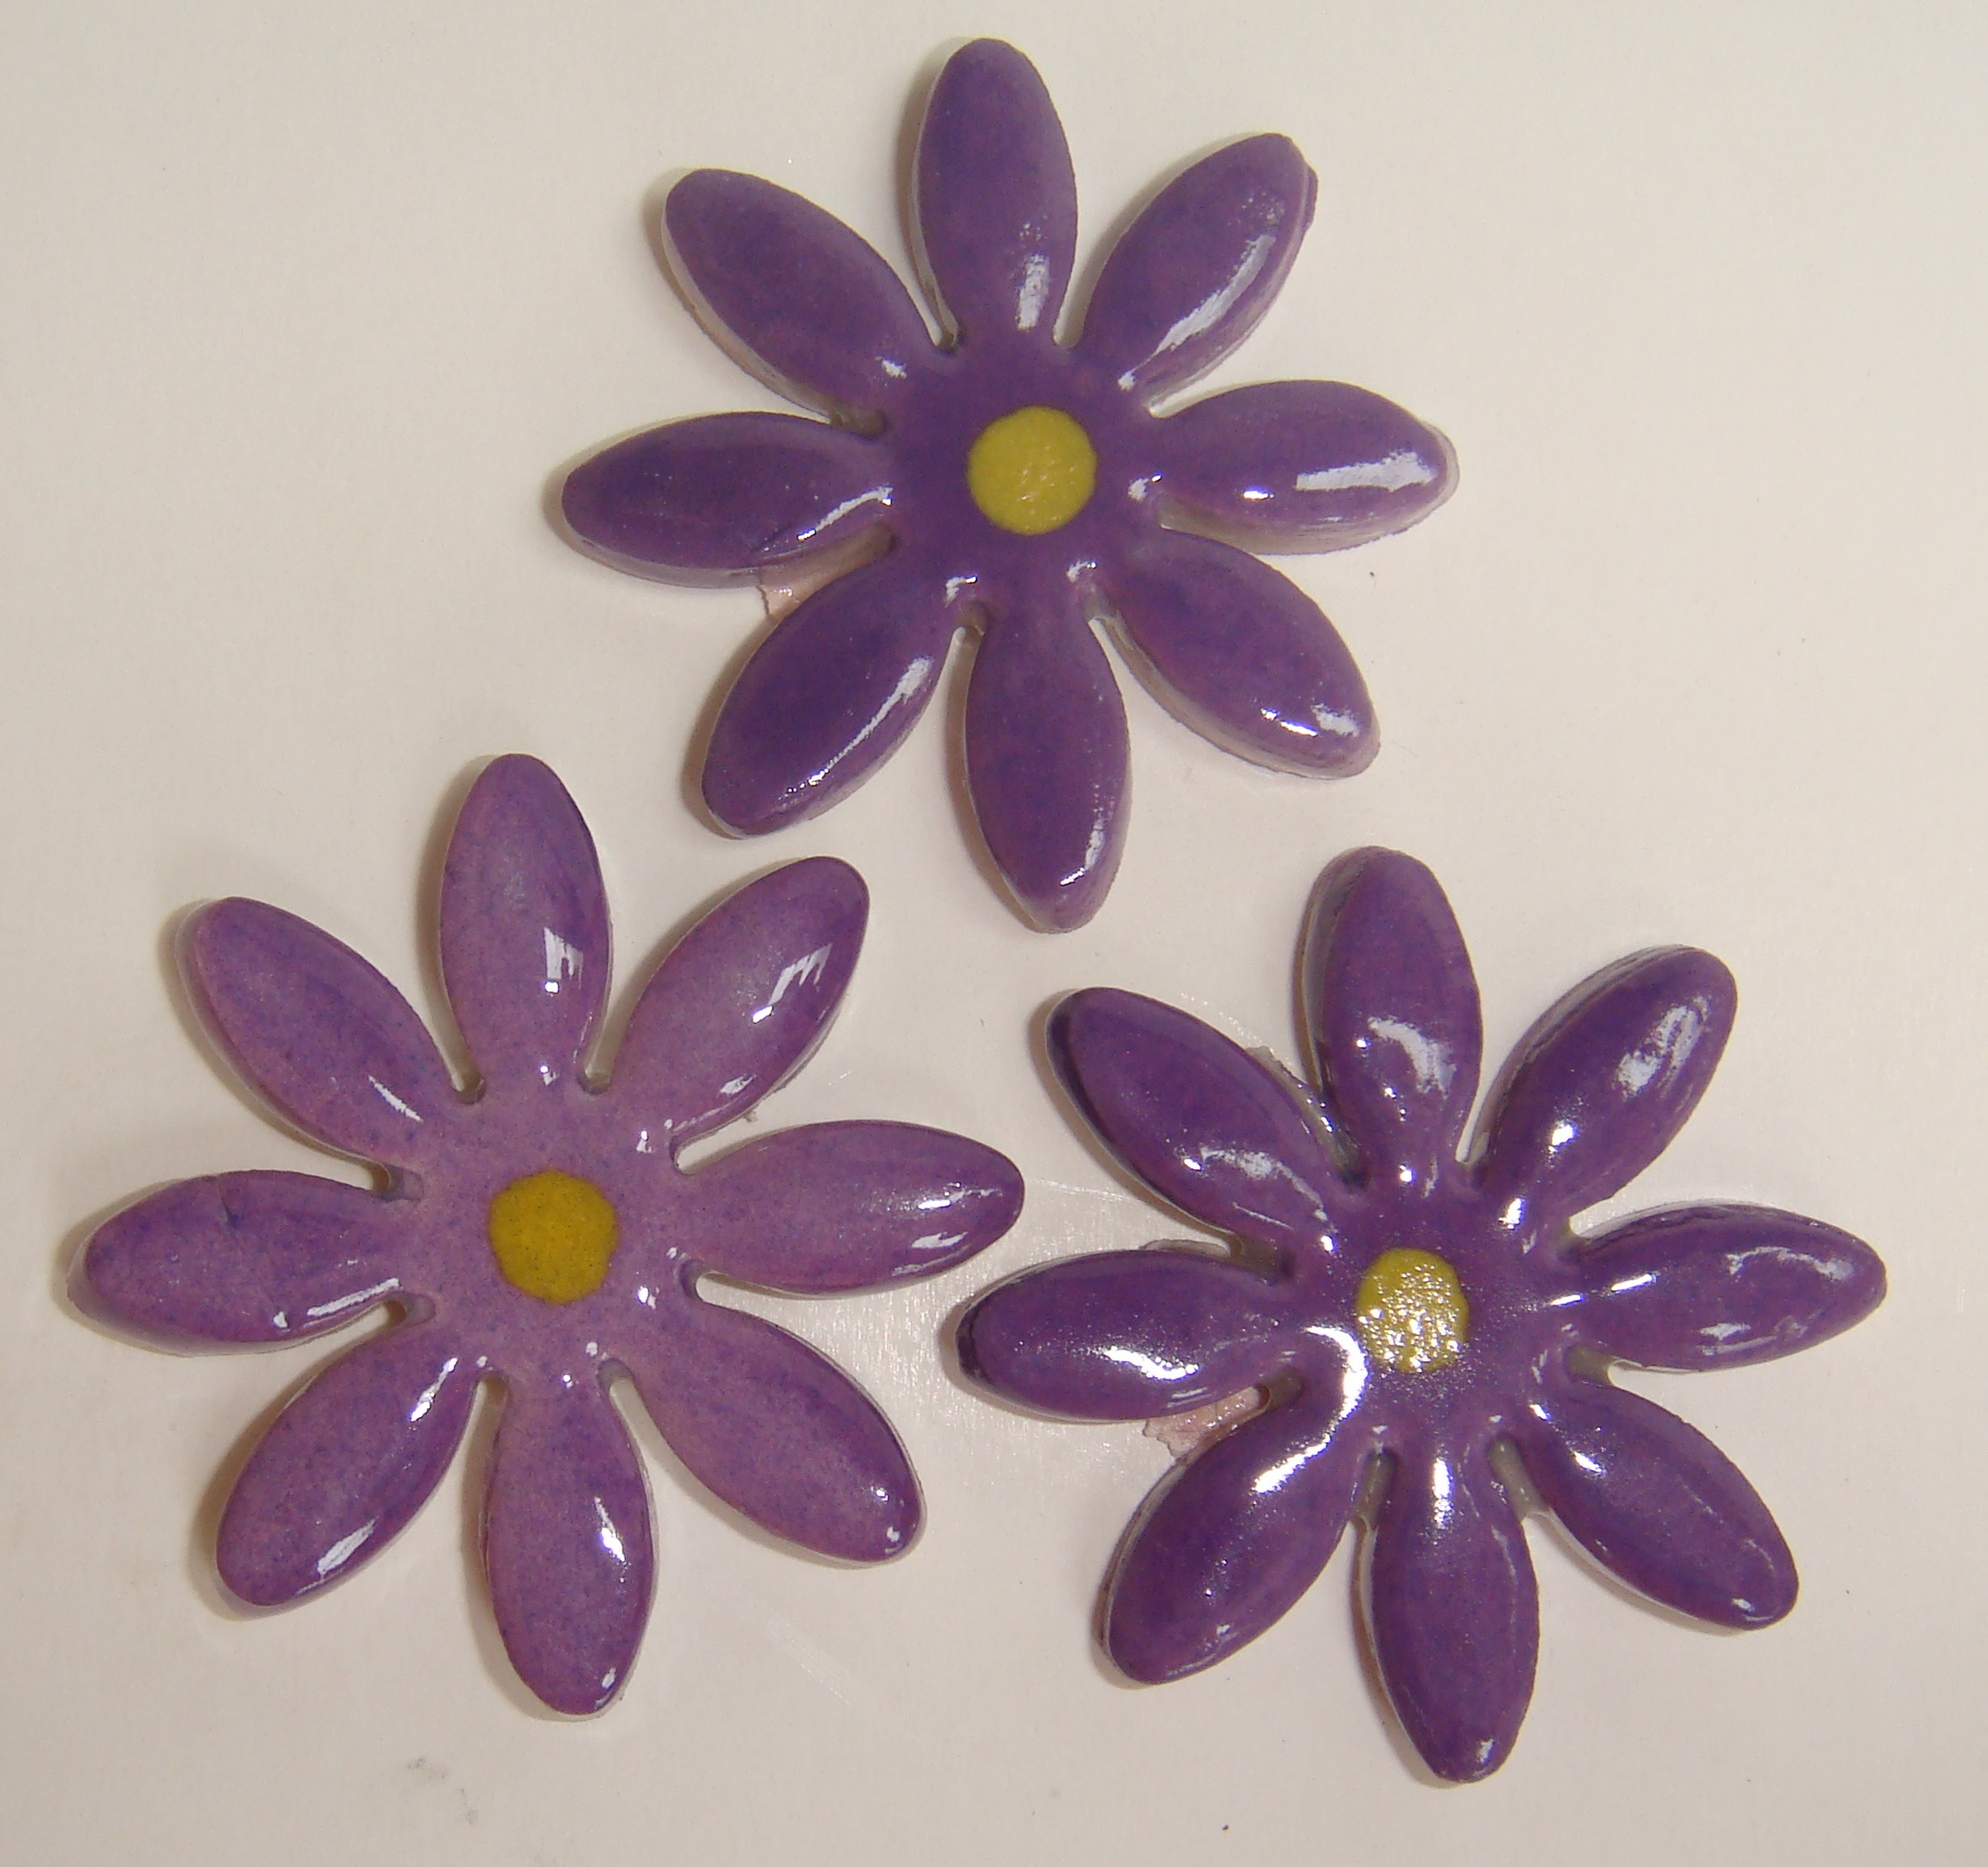 FLO-002 Daisy Large Purple